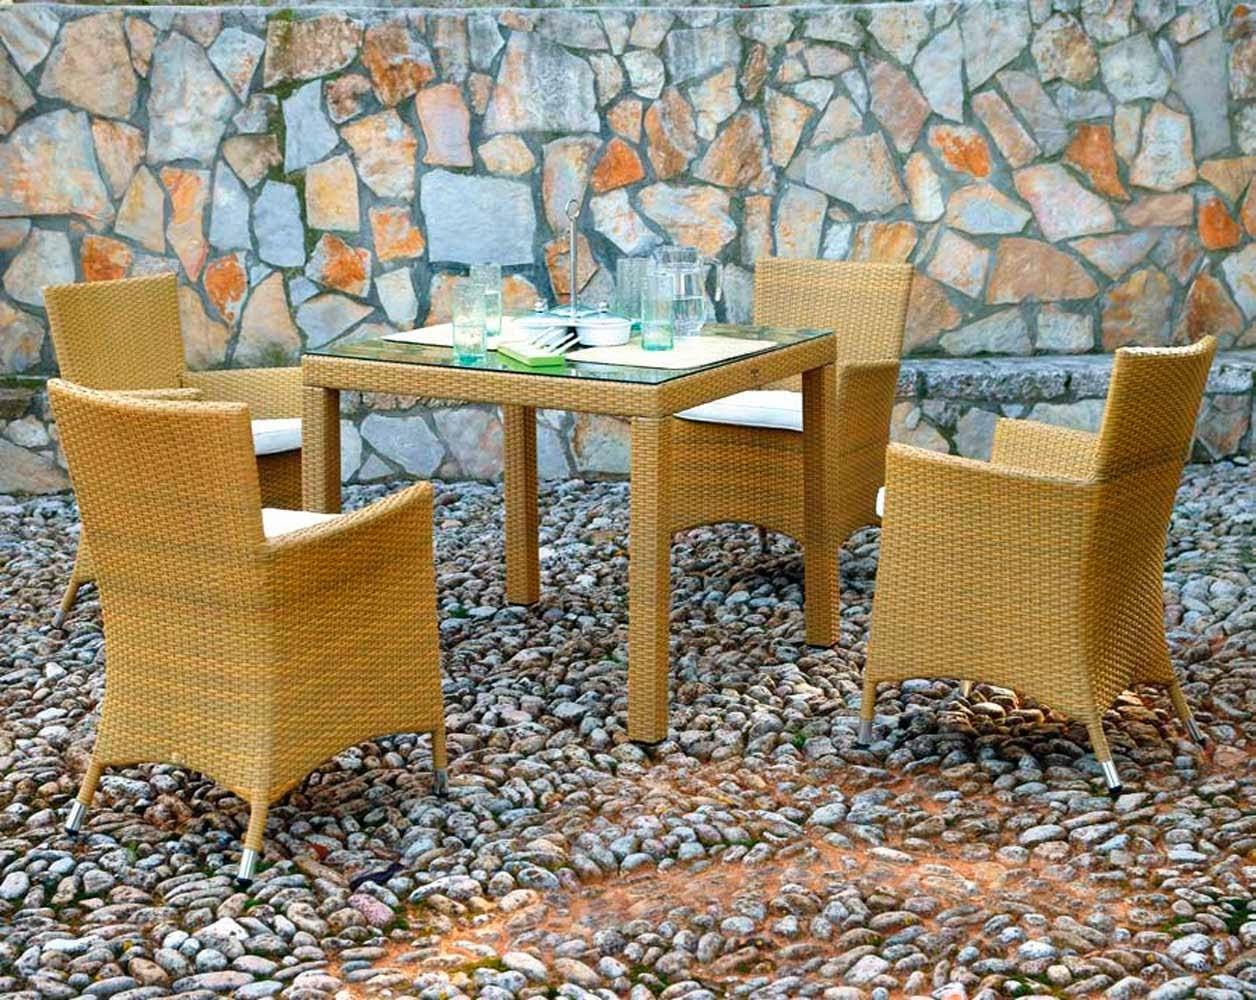 Blog de mbar muebles muebles de jard n y terraza for Muebles jardin terraza